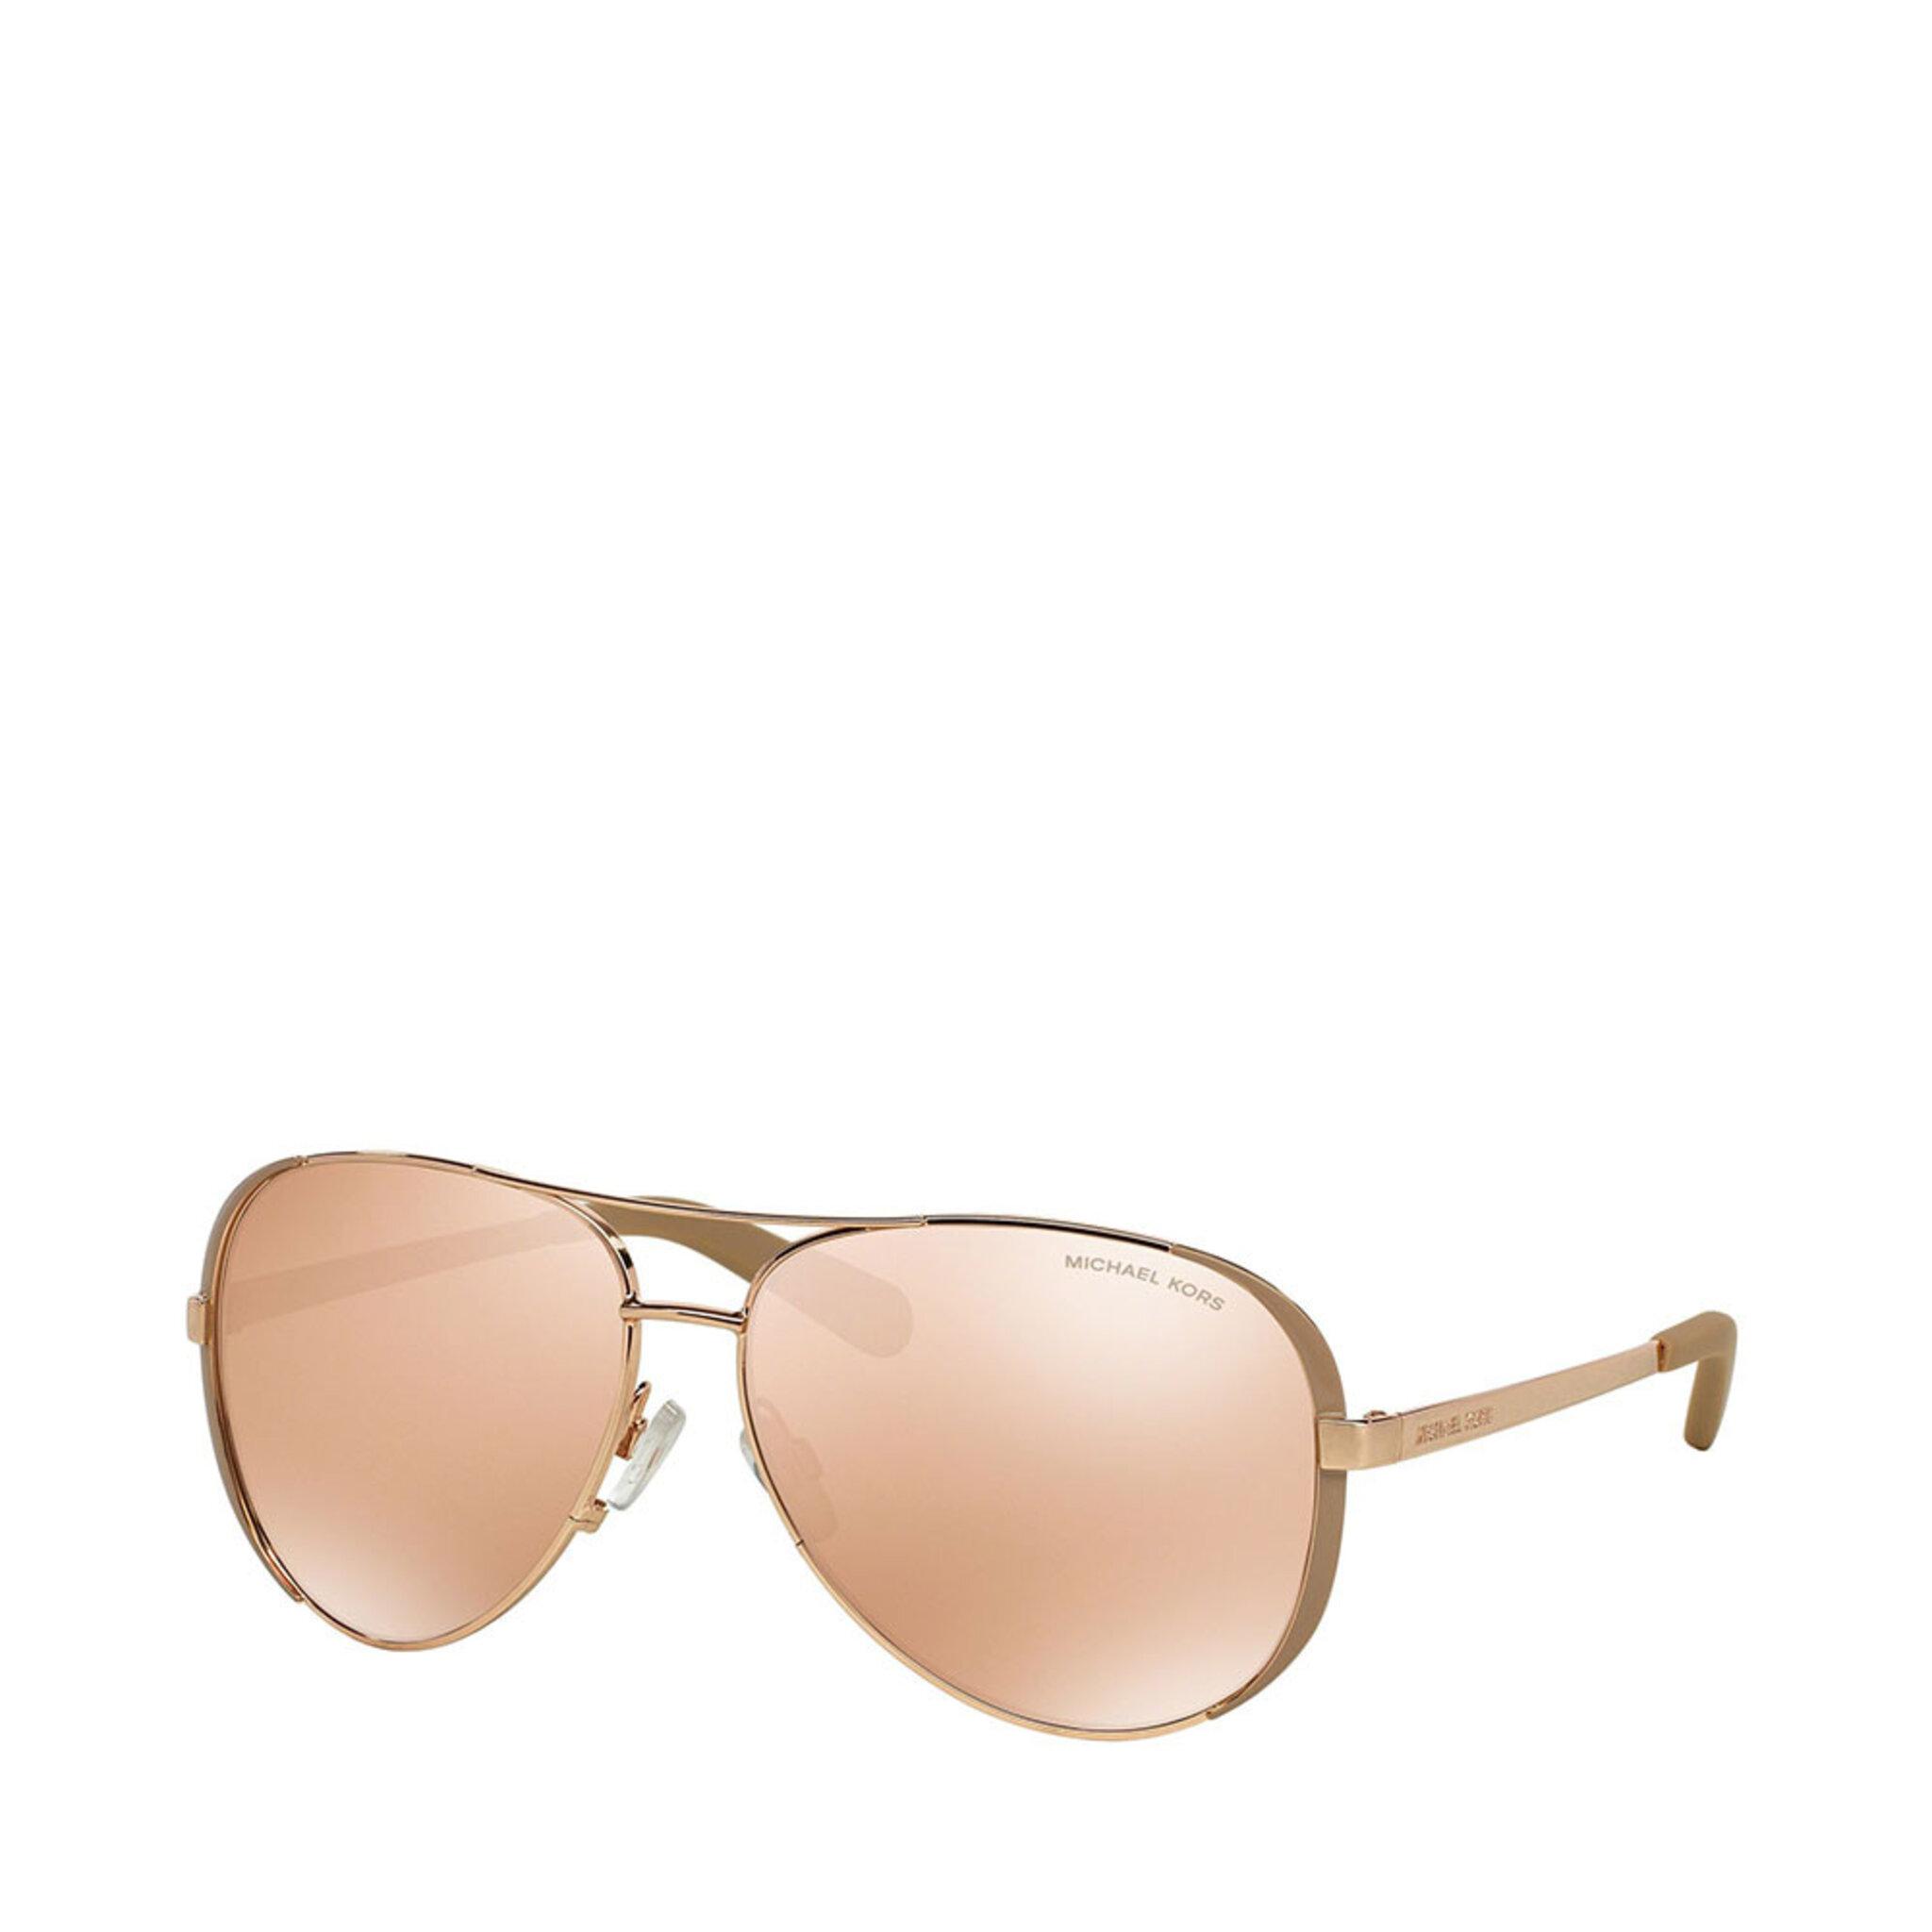 Solglasögon, Soft Touch, 59